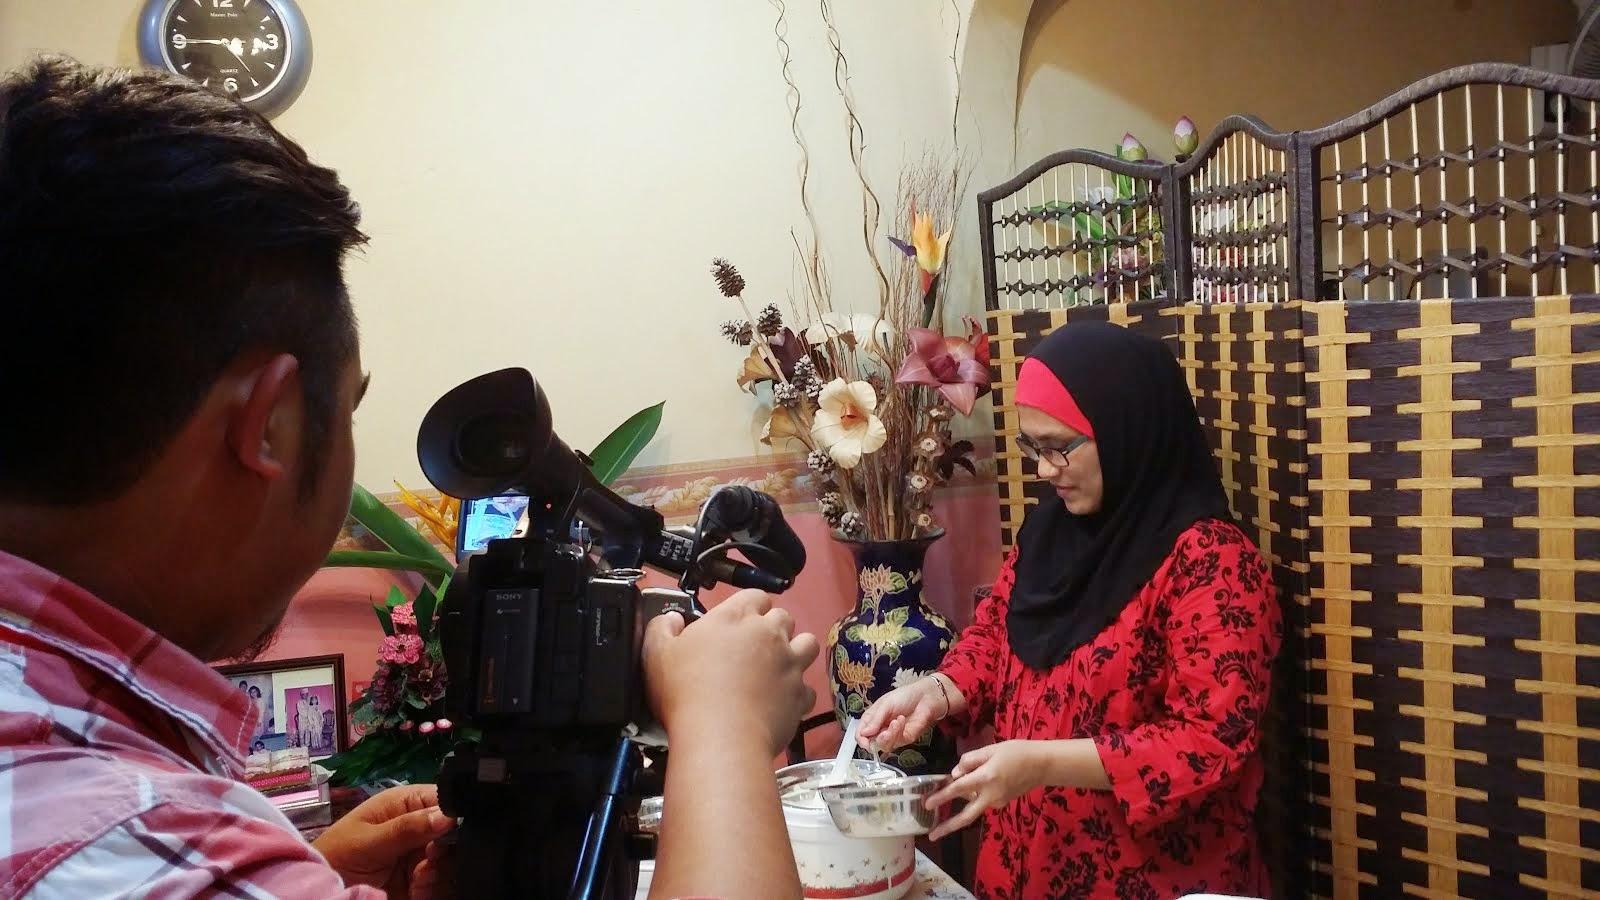 MALAYSIA 1NEWS - 14/1/2014